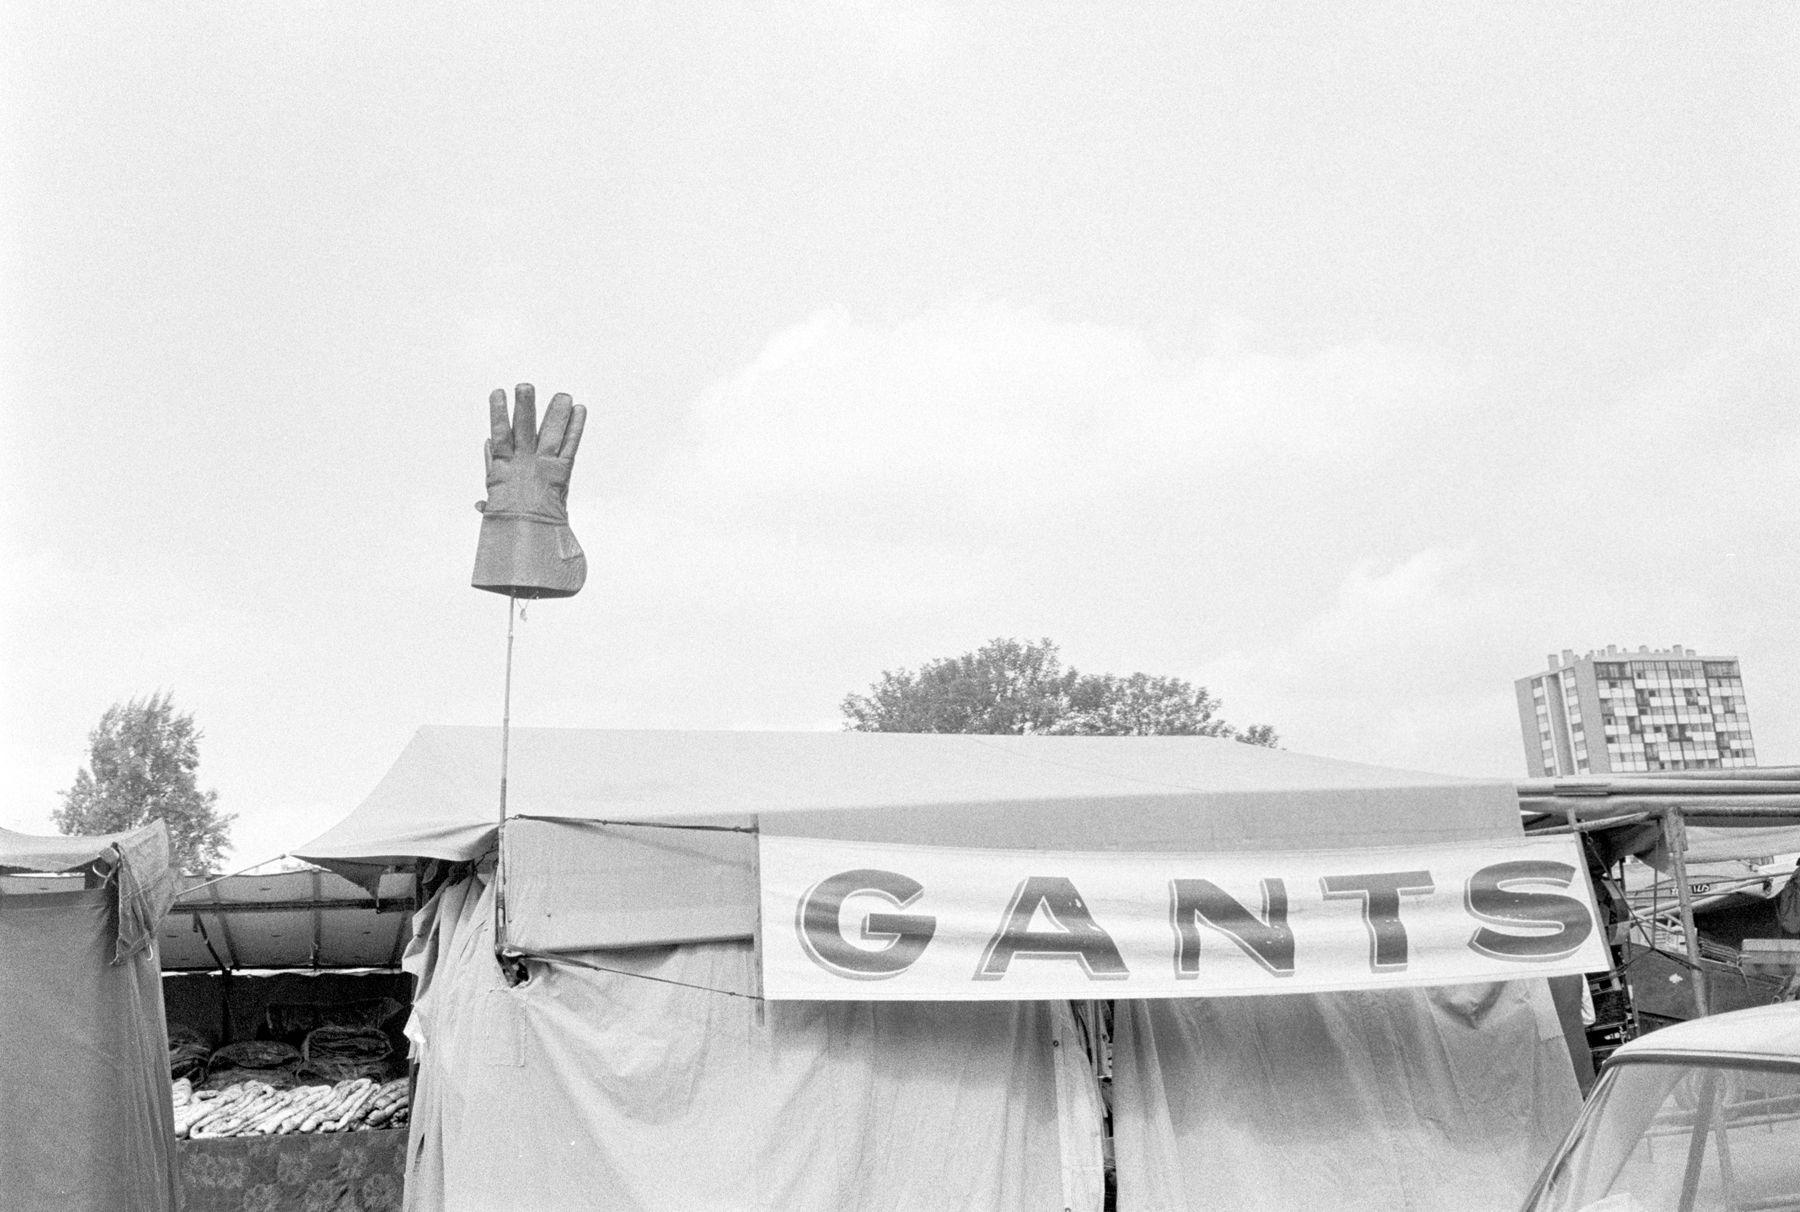 Joel Meyerowitz - European Trip: Photographs from the Car, 1968 2014 Howard Greenberg Gallery